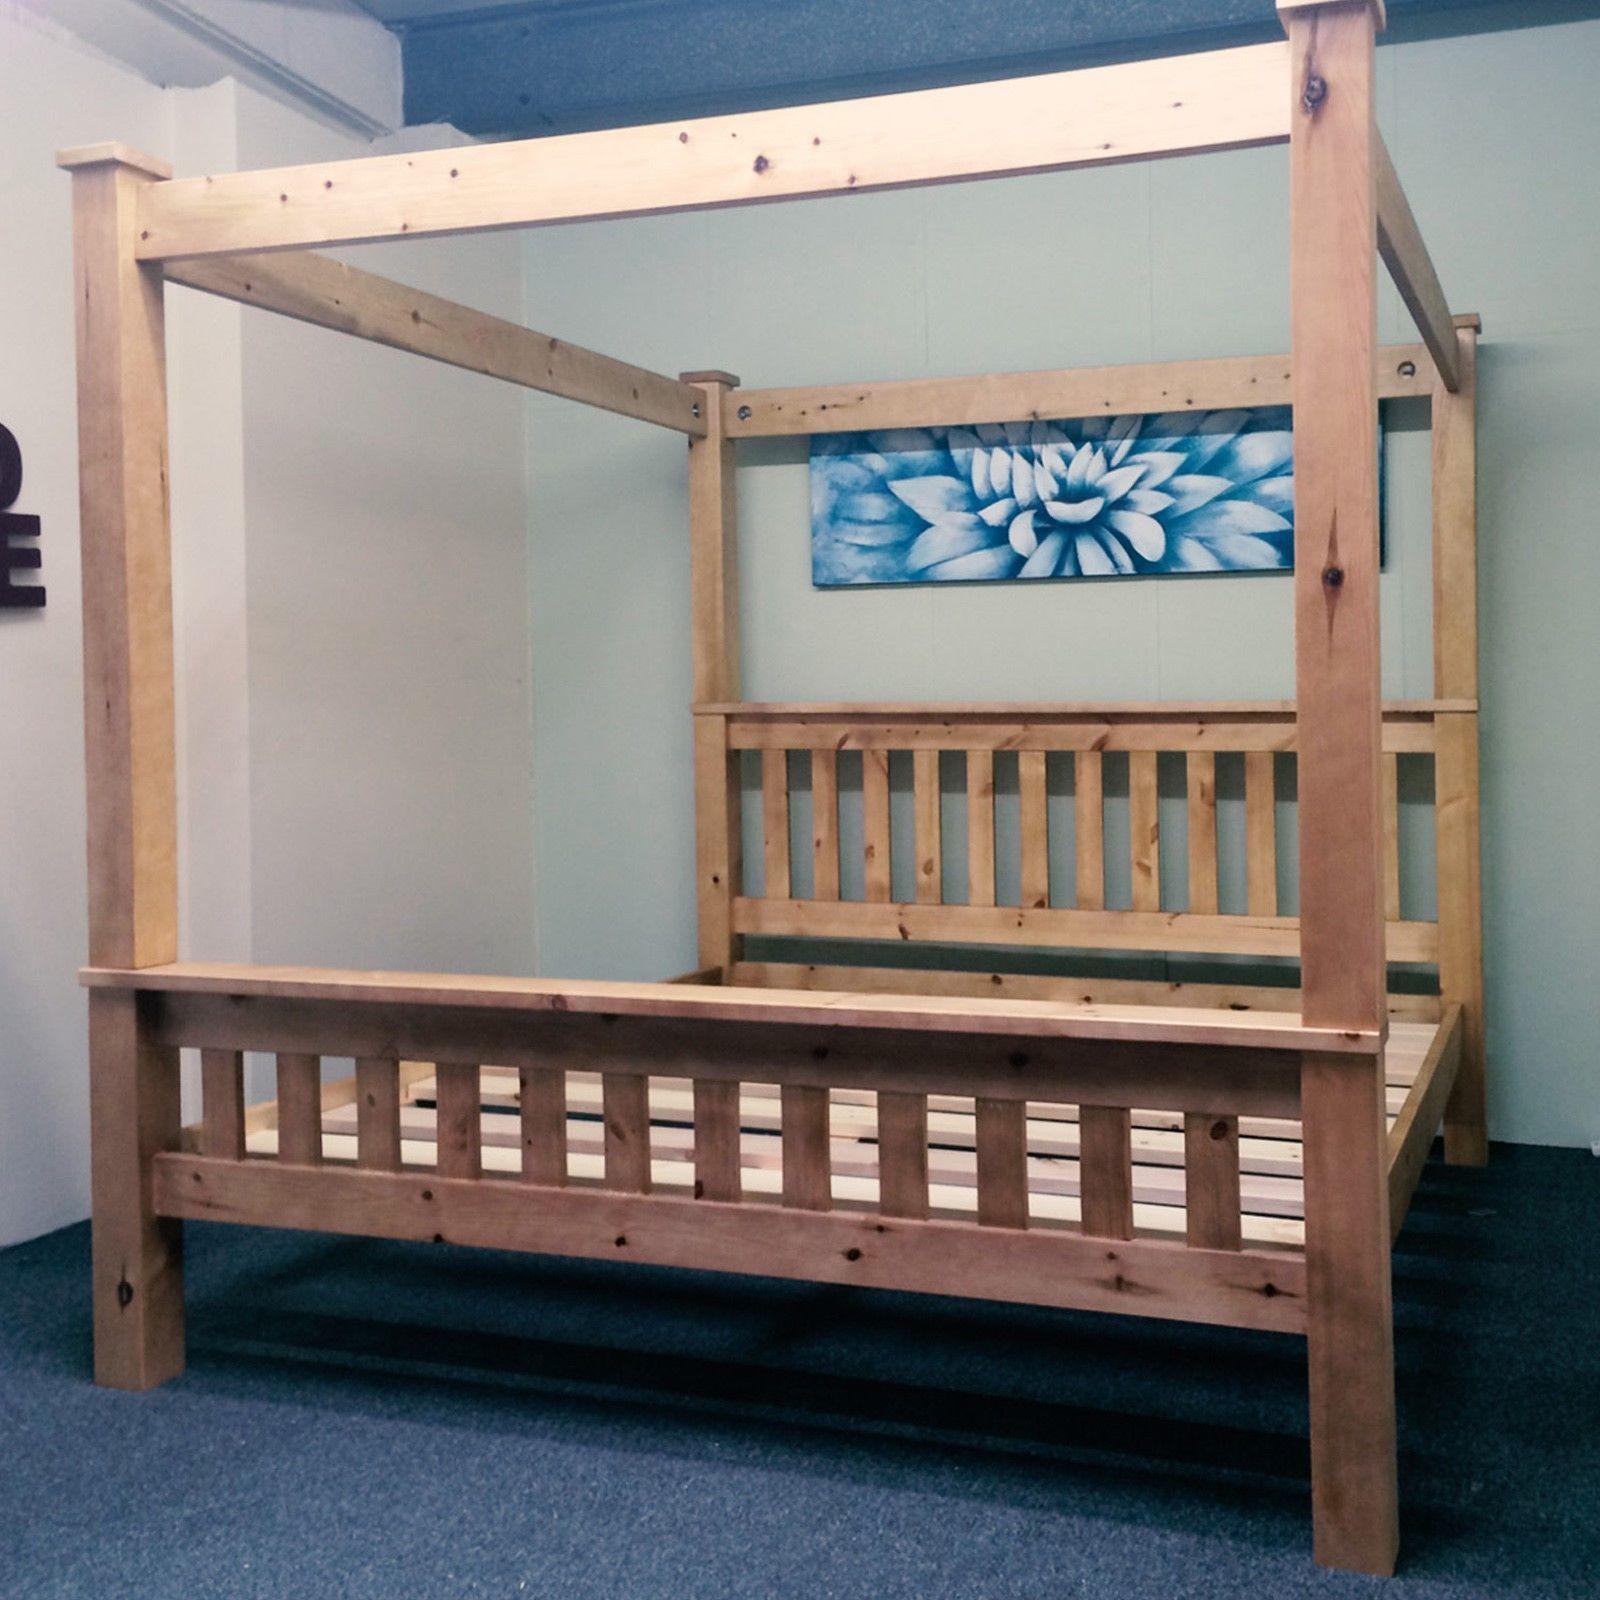 Solid Pine Bed - FOUR POSTER (NEW) Winner Select 5FT Kingsize or 6FT Super King https://t.co/o85KA90qey https://t.co/dUaQ4ZEnOG